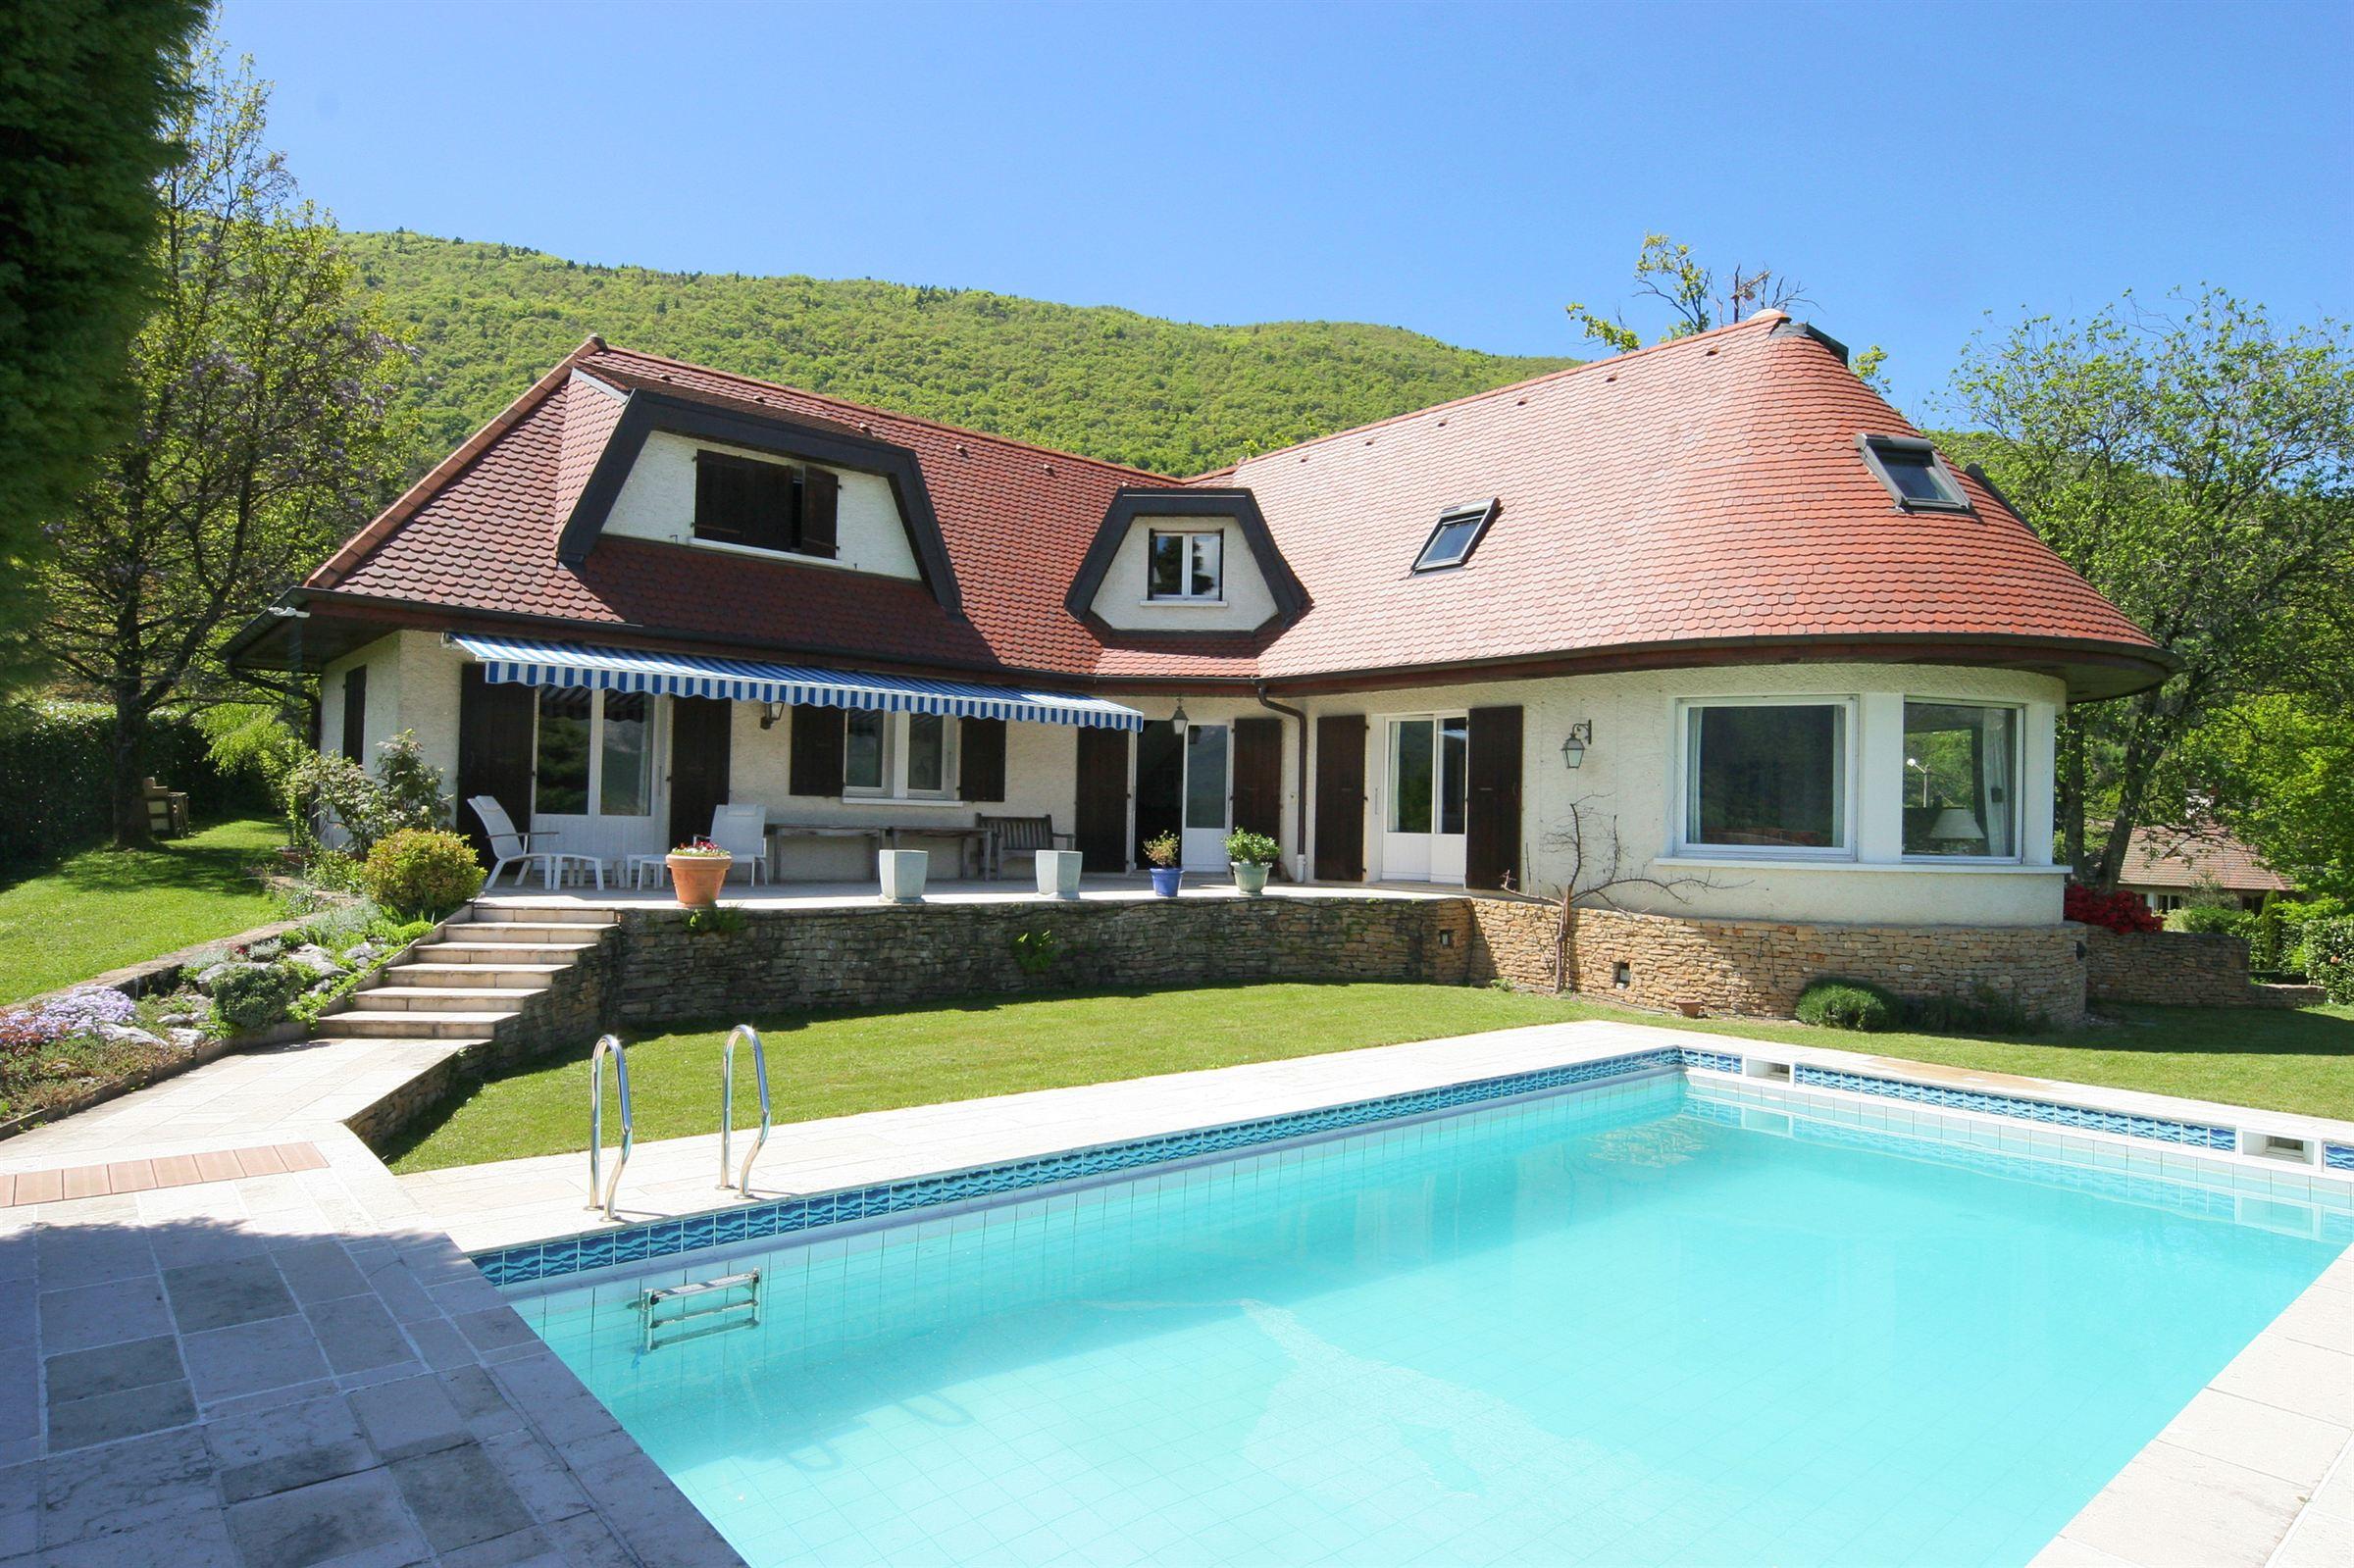 Villa per Vendita alle ore High-quality villa overlooking the lake with chalet and swimming pool Sevrier, Rodano-Alpi, 74320 Francia